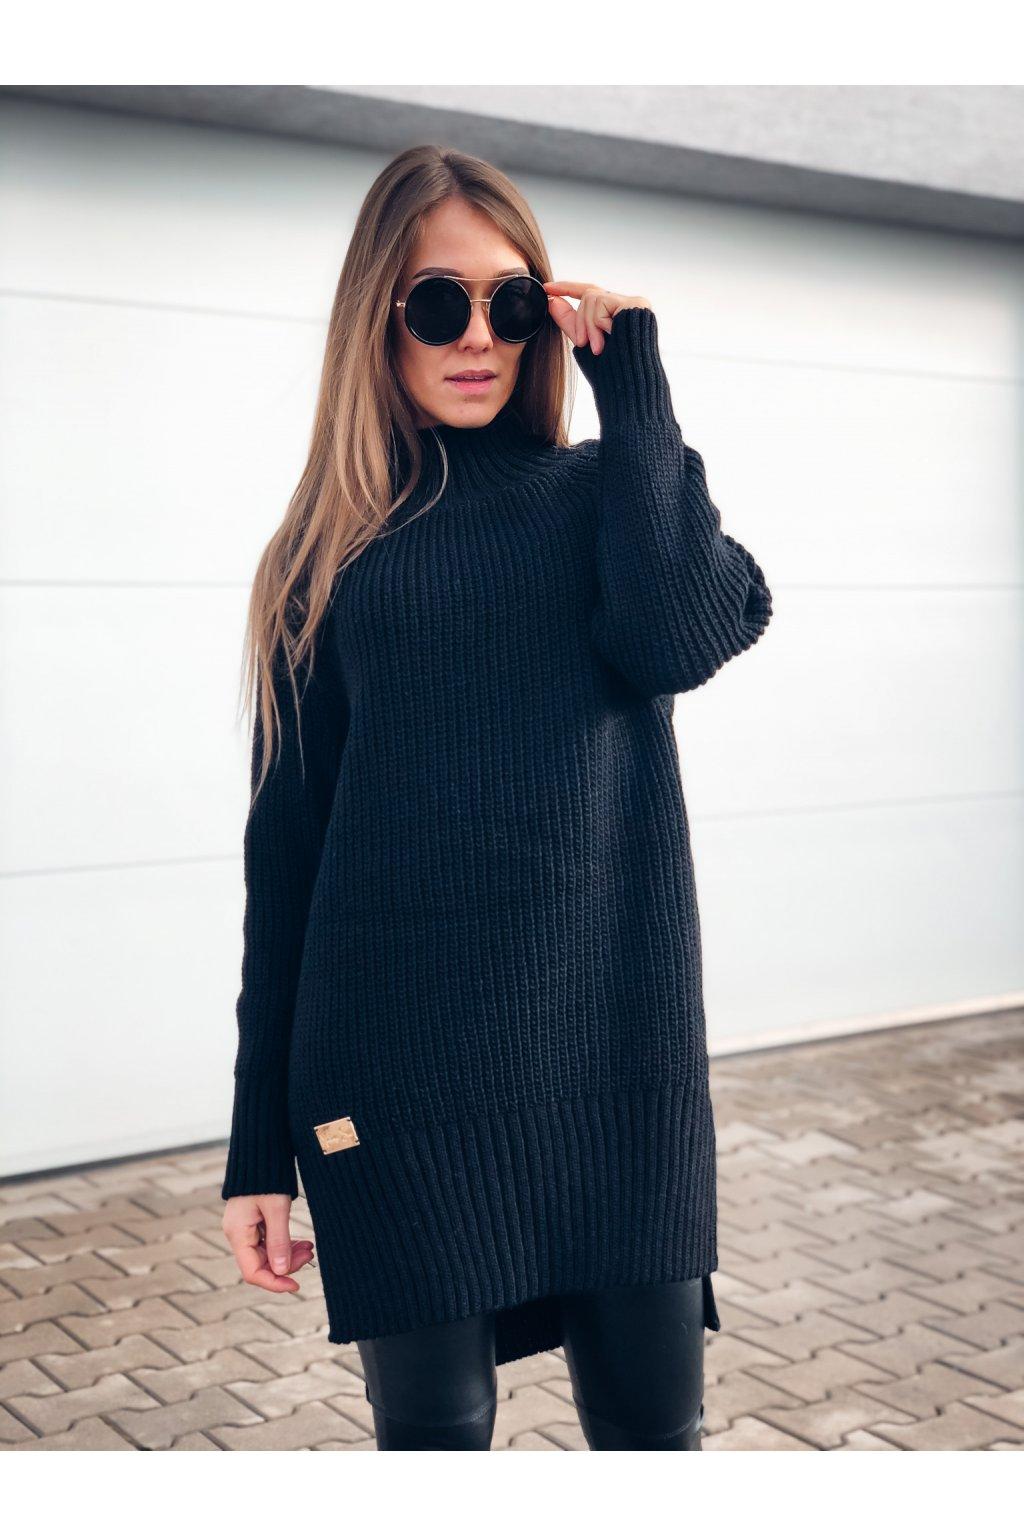 damsky prodlouzeny svetr black eshopat cz 1